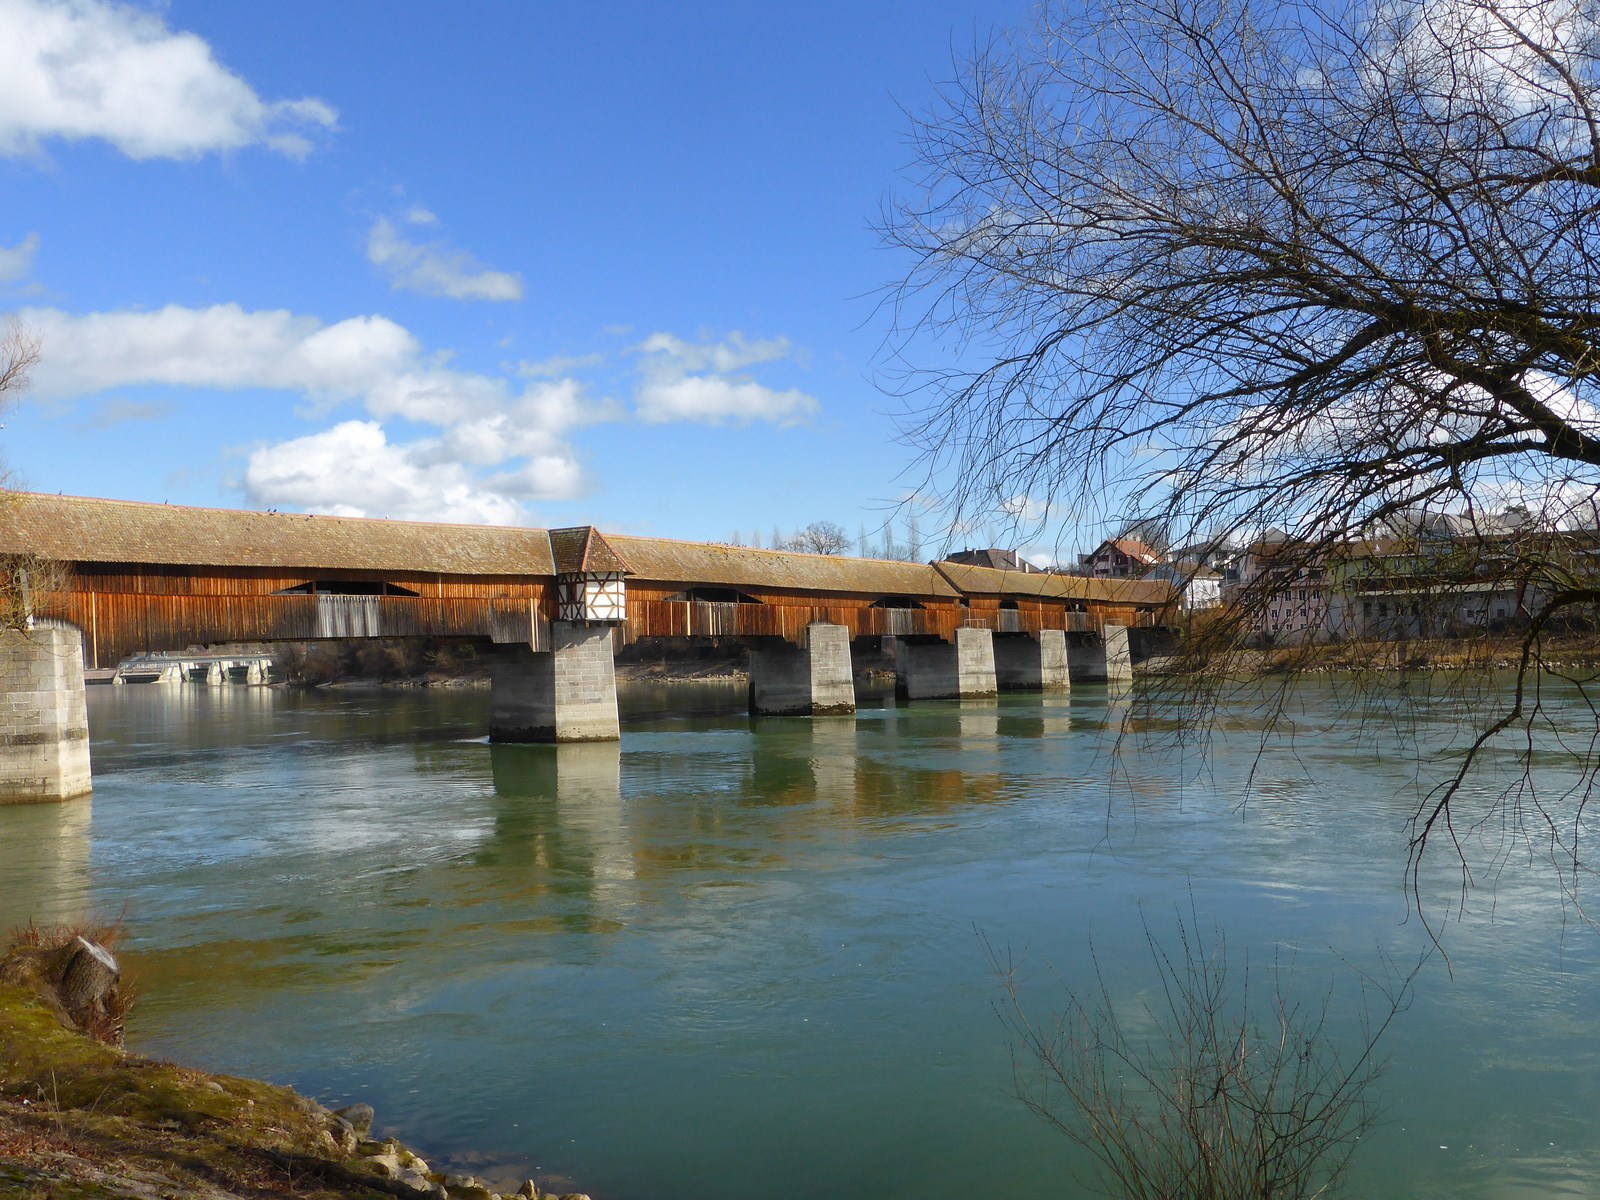 Holzbrücke Bad Säckingen © Hartmut Hermanns